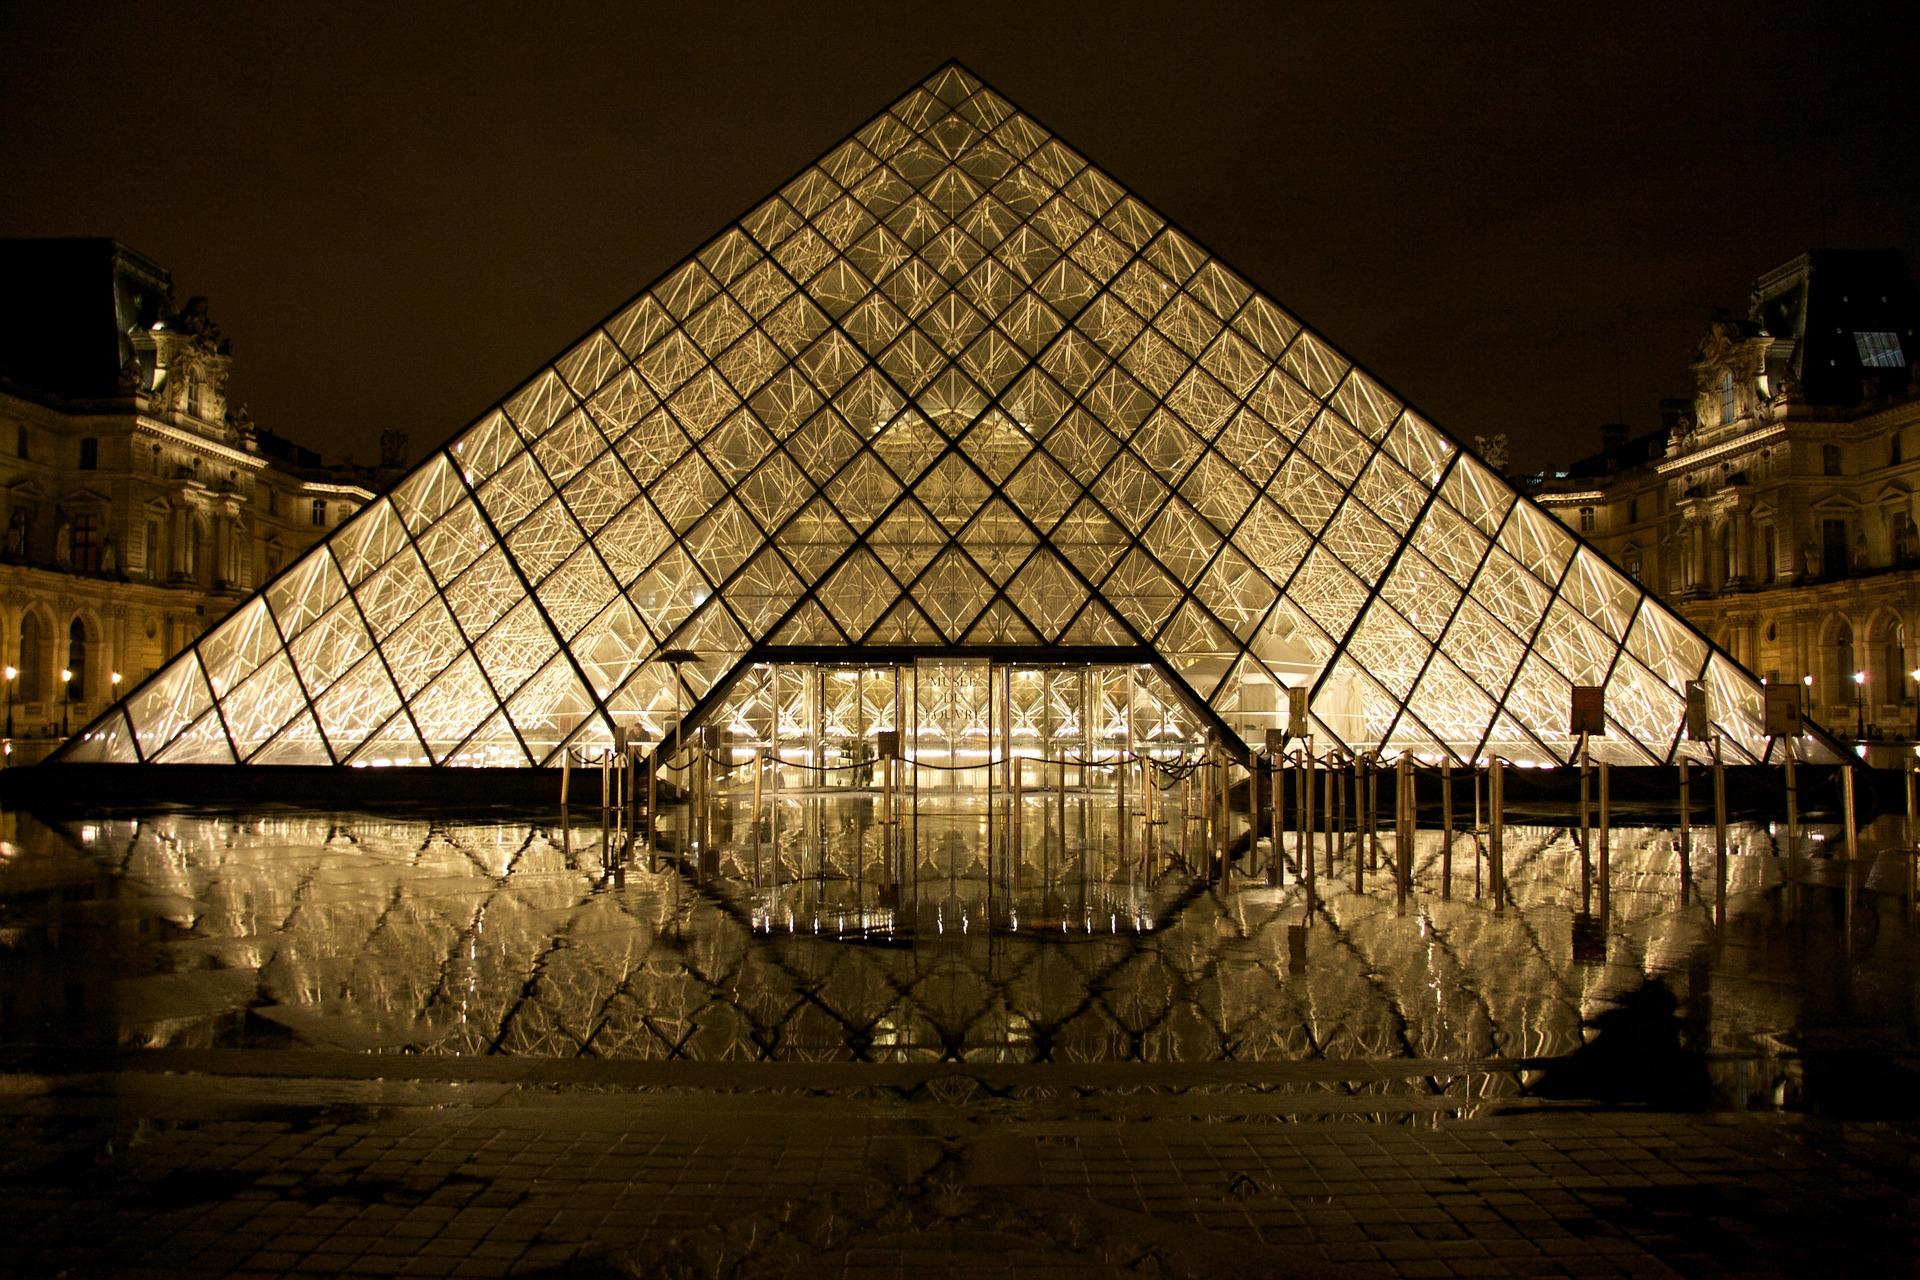 Museo, Louvre, Parigi, Francia, Piramide - Sfondi HD - Professor-falken.com